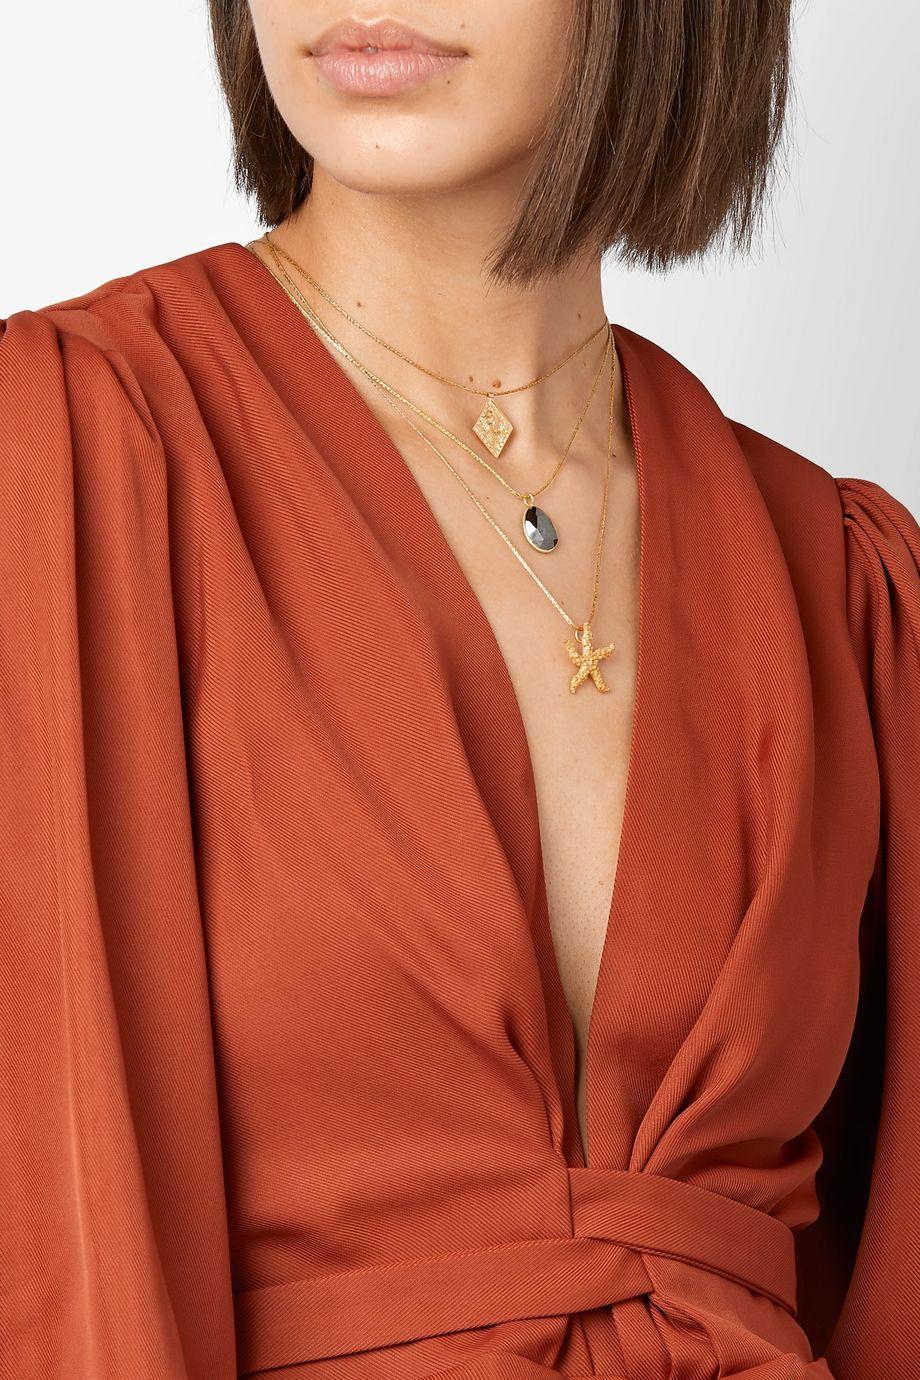 Pippa Small 18-karat gold hematite necklace